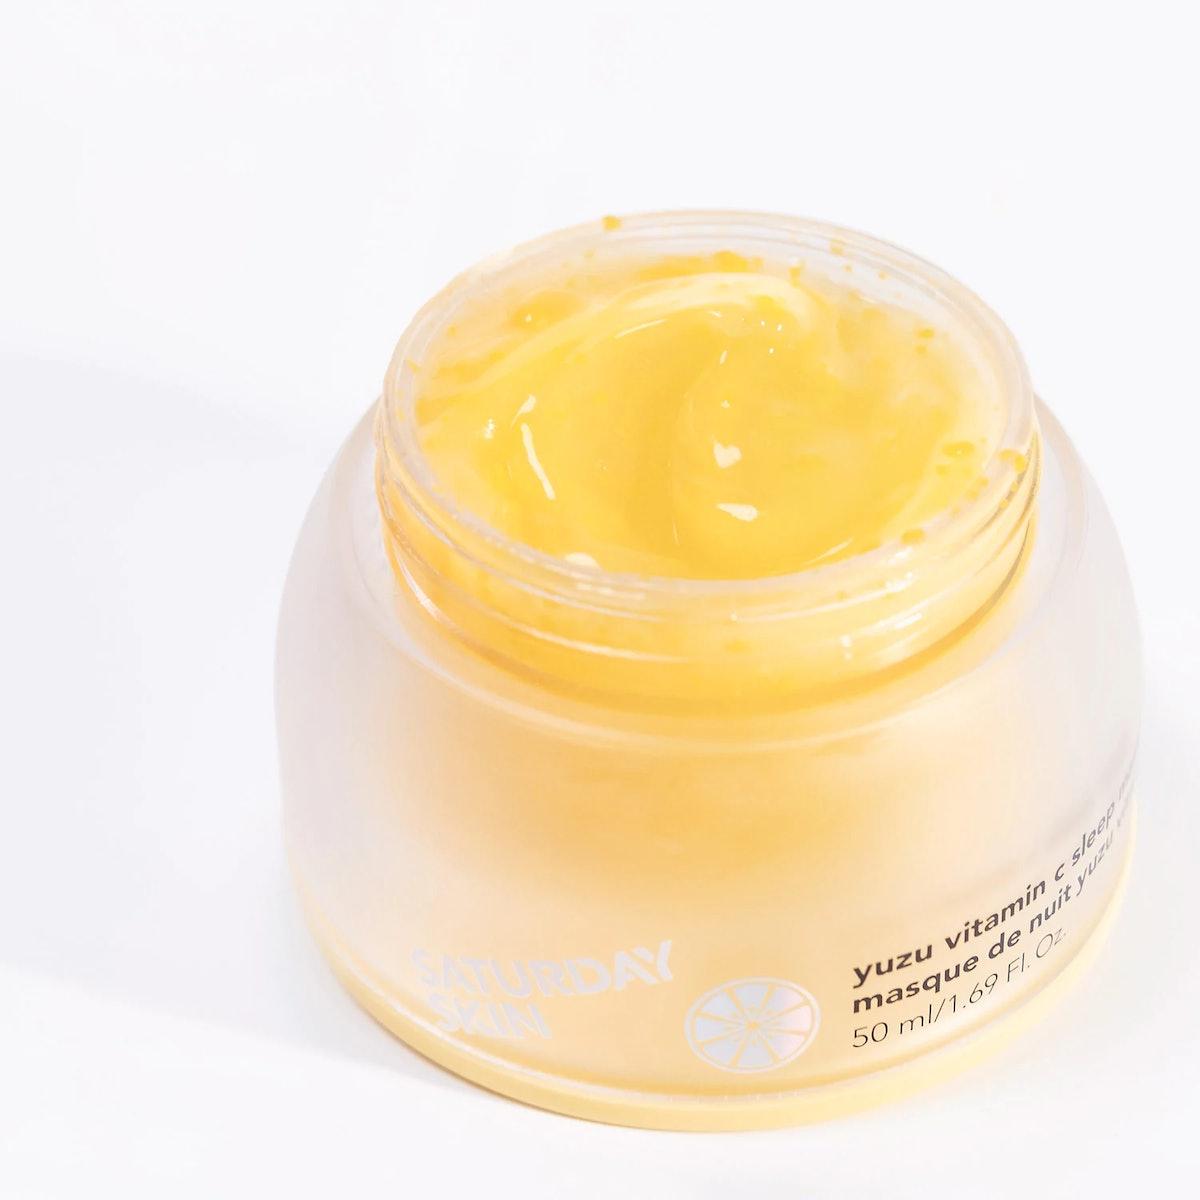 Saturday Skin's Yuzu Vitamin C Sleep Mask texture in jar.